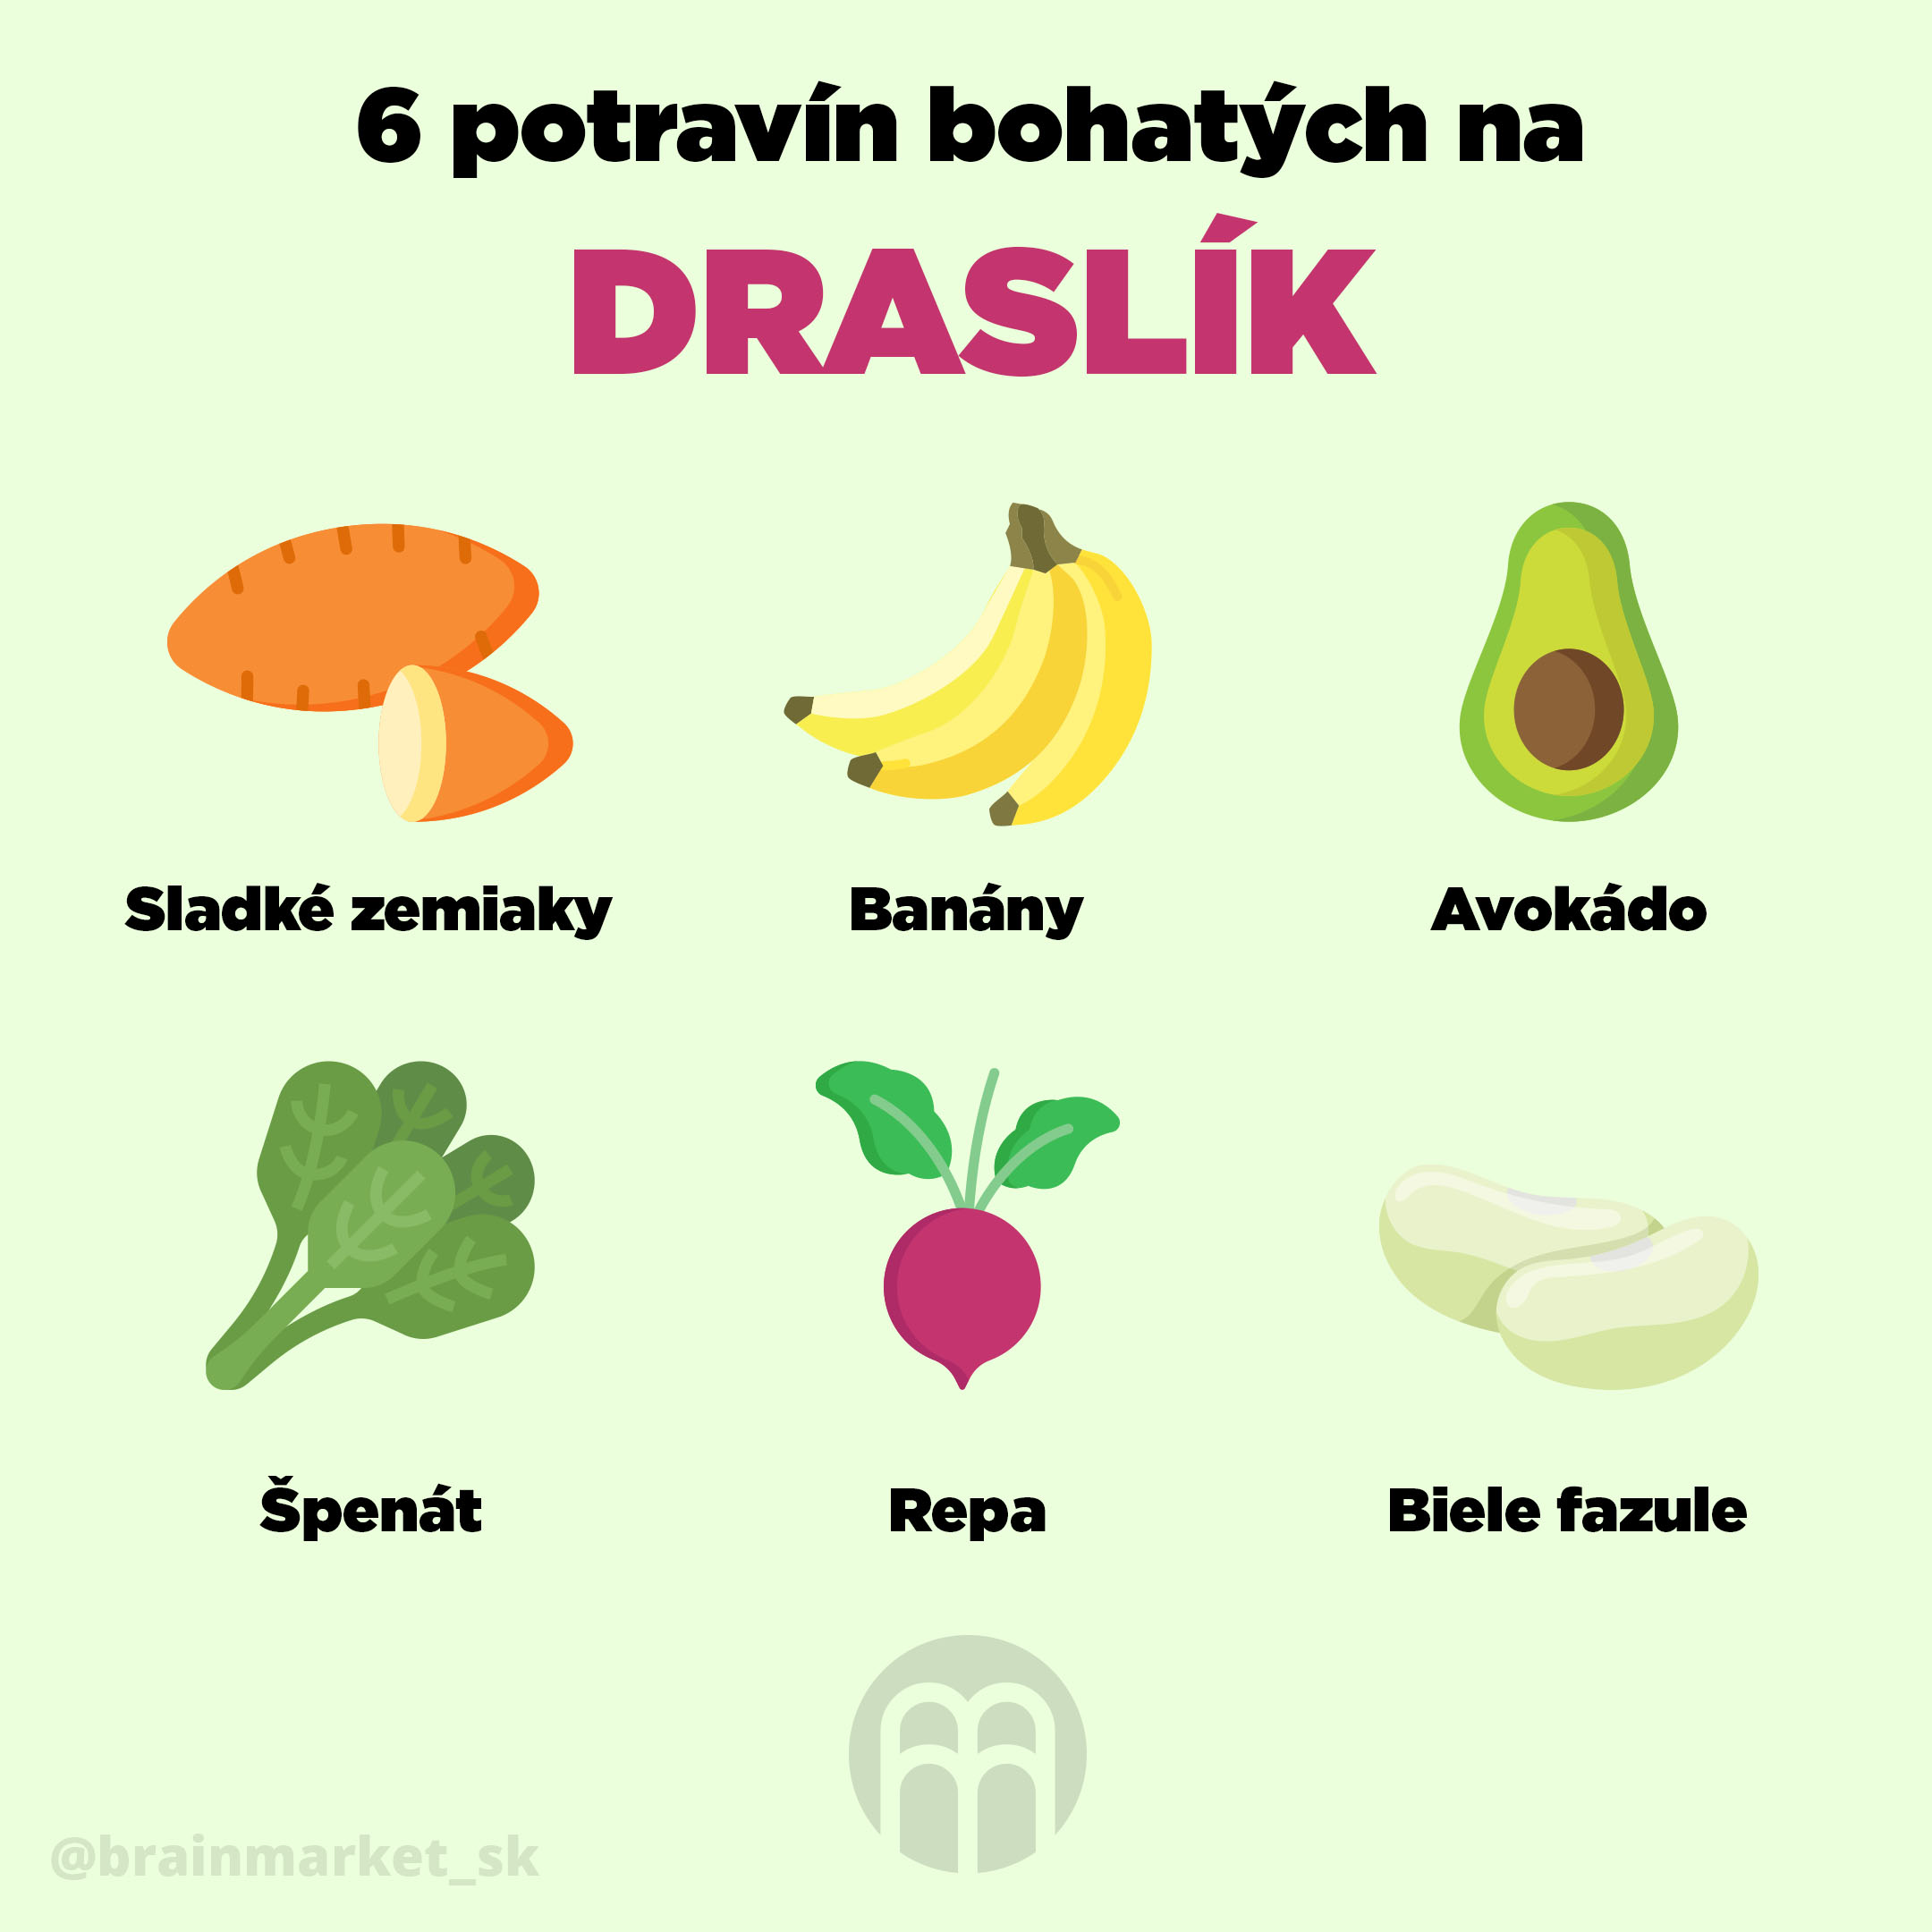 6_potravin_bohatych_na_draslik_SK_Infografika_Instagram_BrainMarket